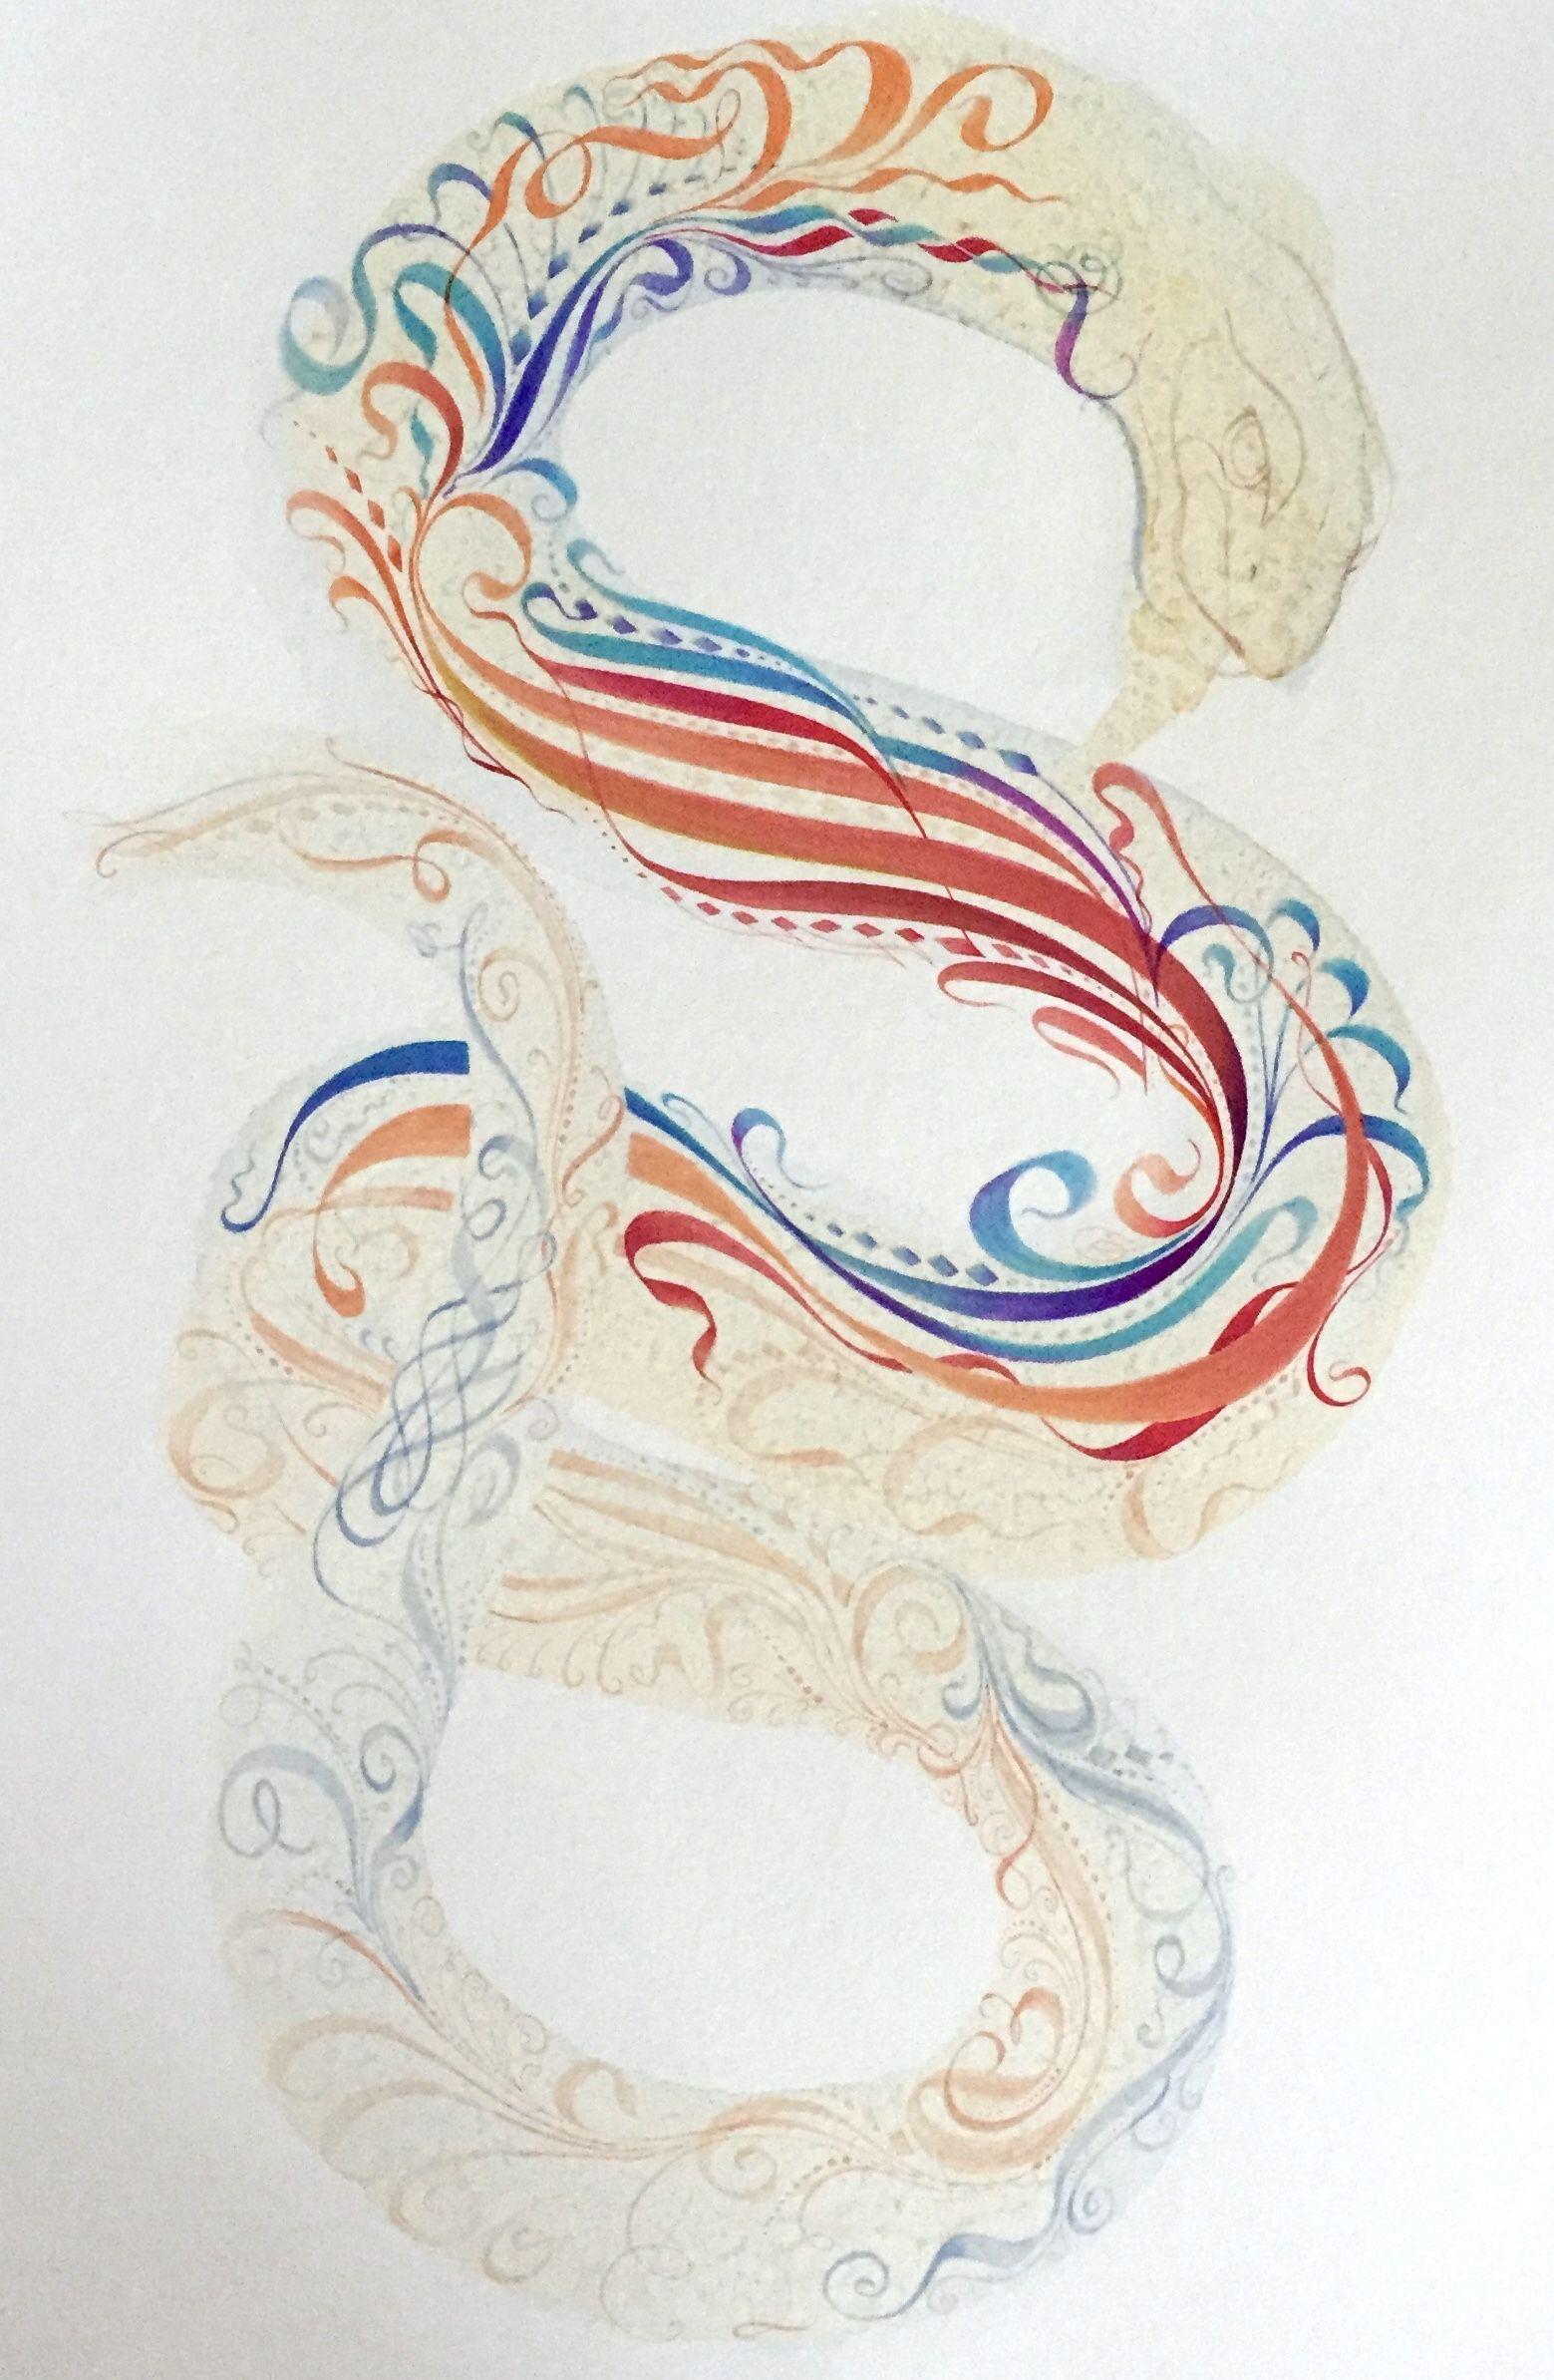 12 Asian Calendar Animal Symbol Illustrations